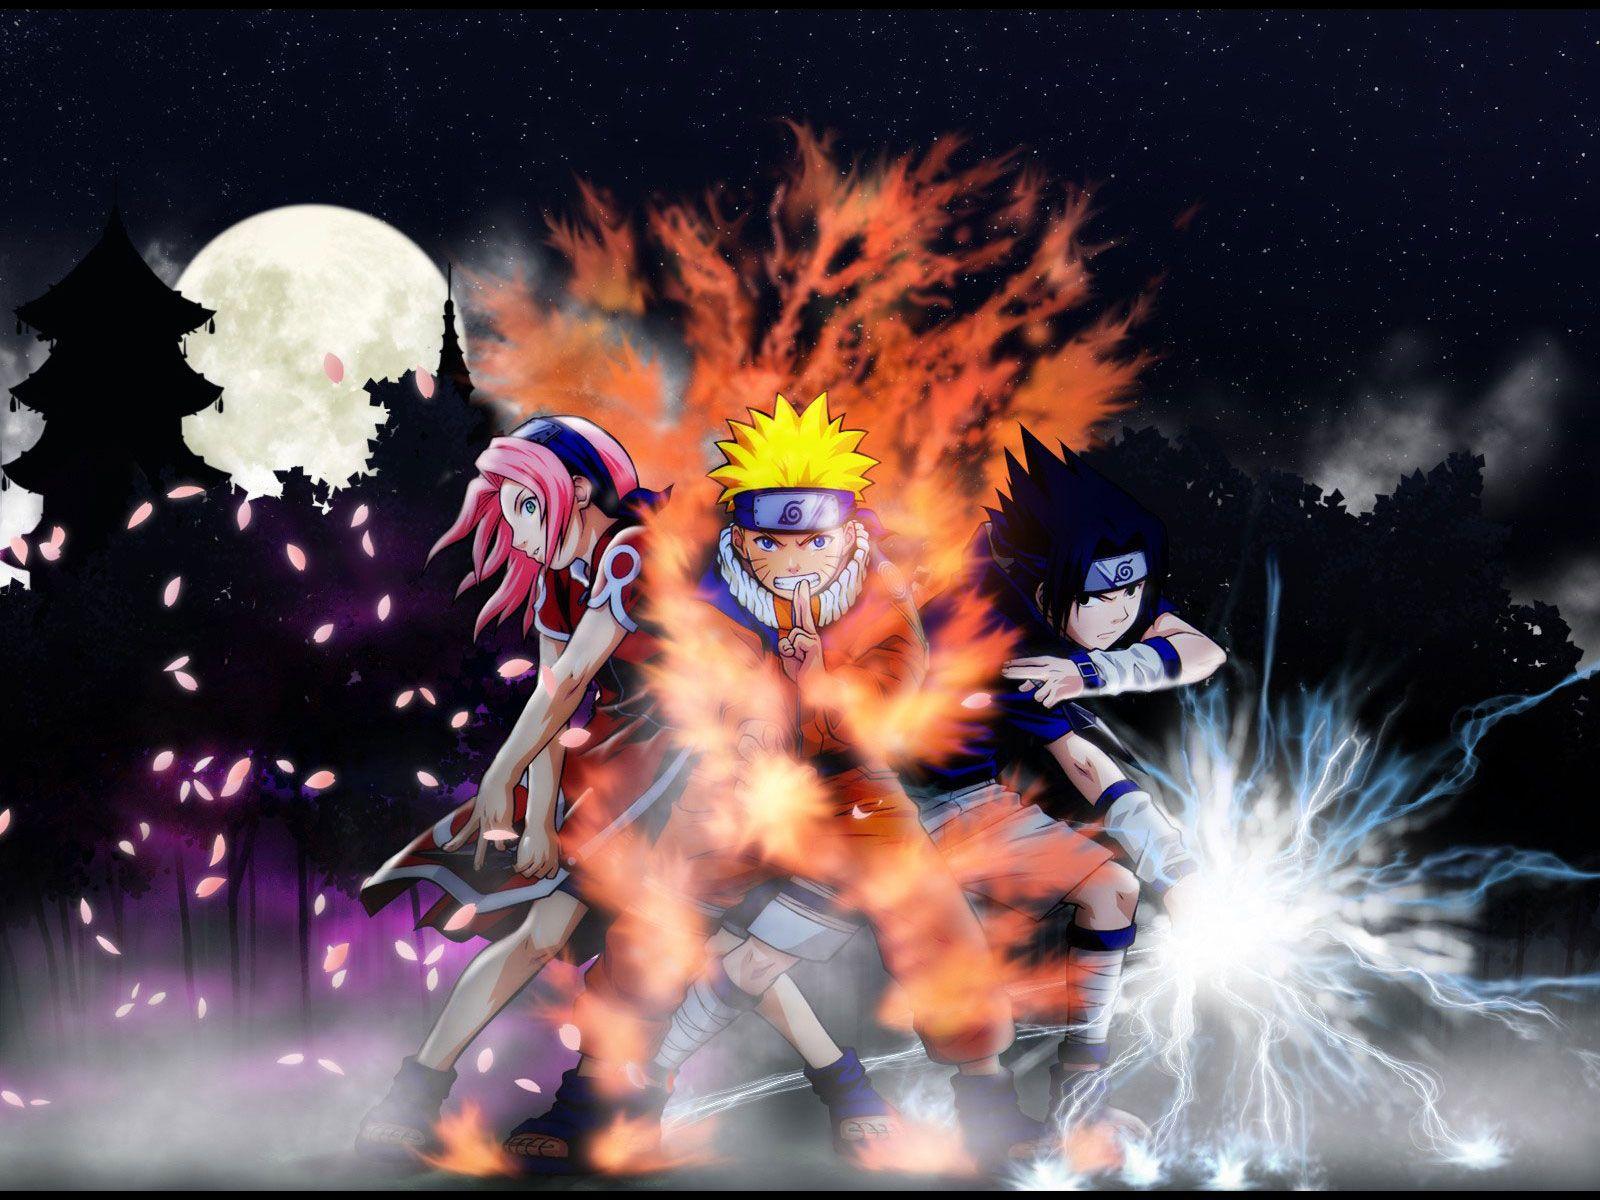 25 Cool And Amazing Anime Wallpapers De Naruto Sasuke Sakura 1600x1200 Download Hd Wallpaper Wallpapertip